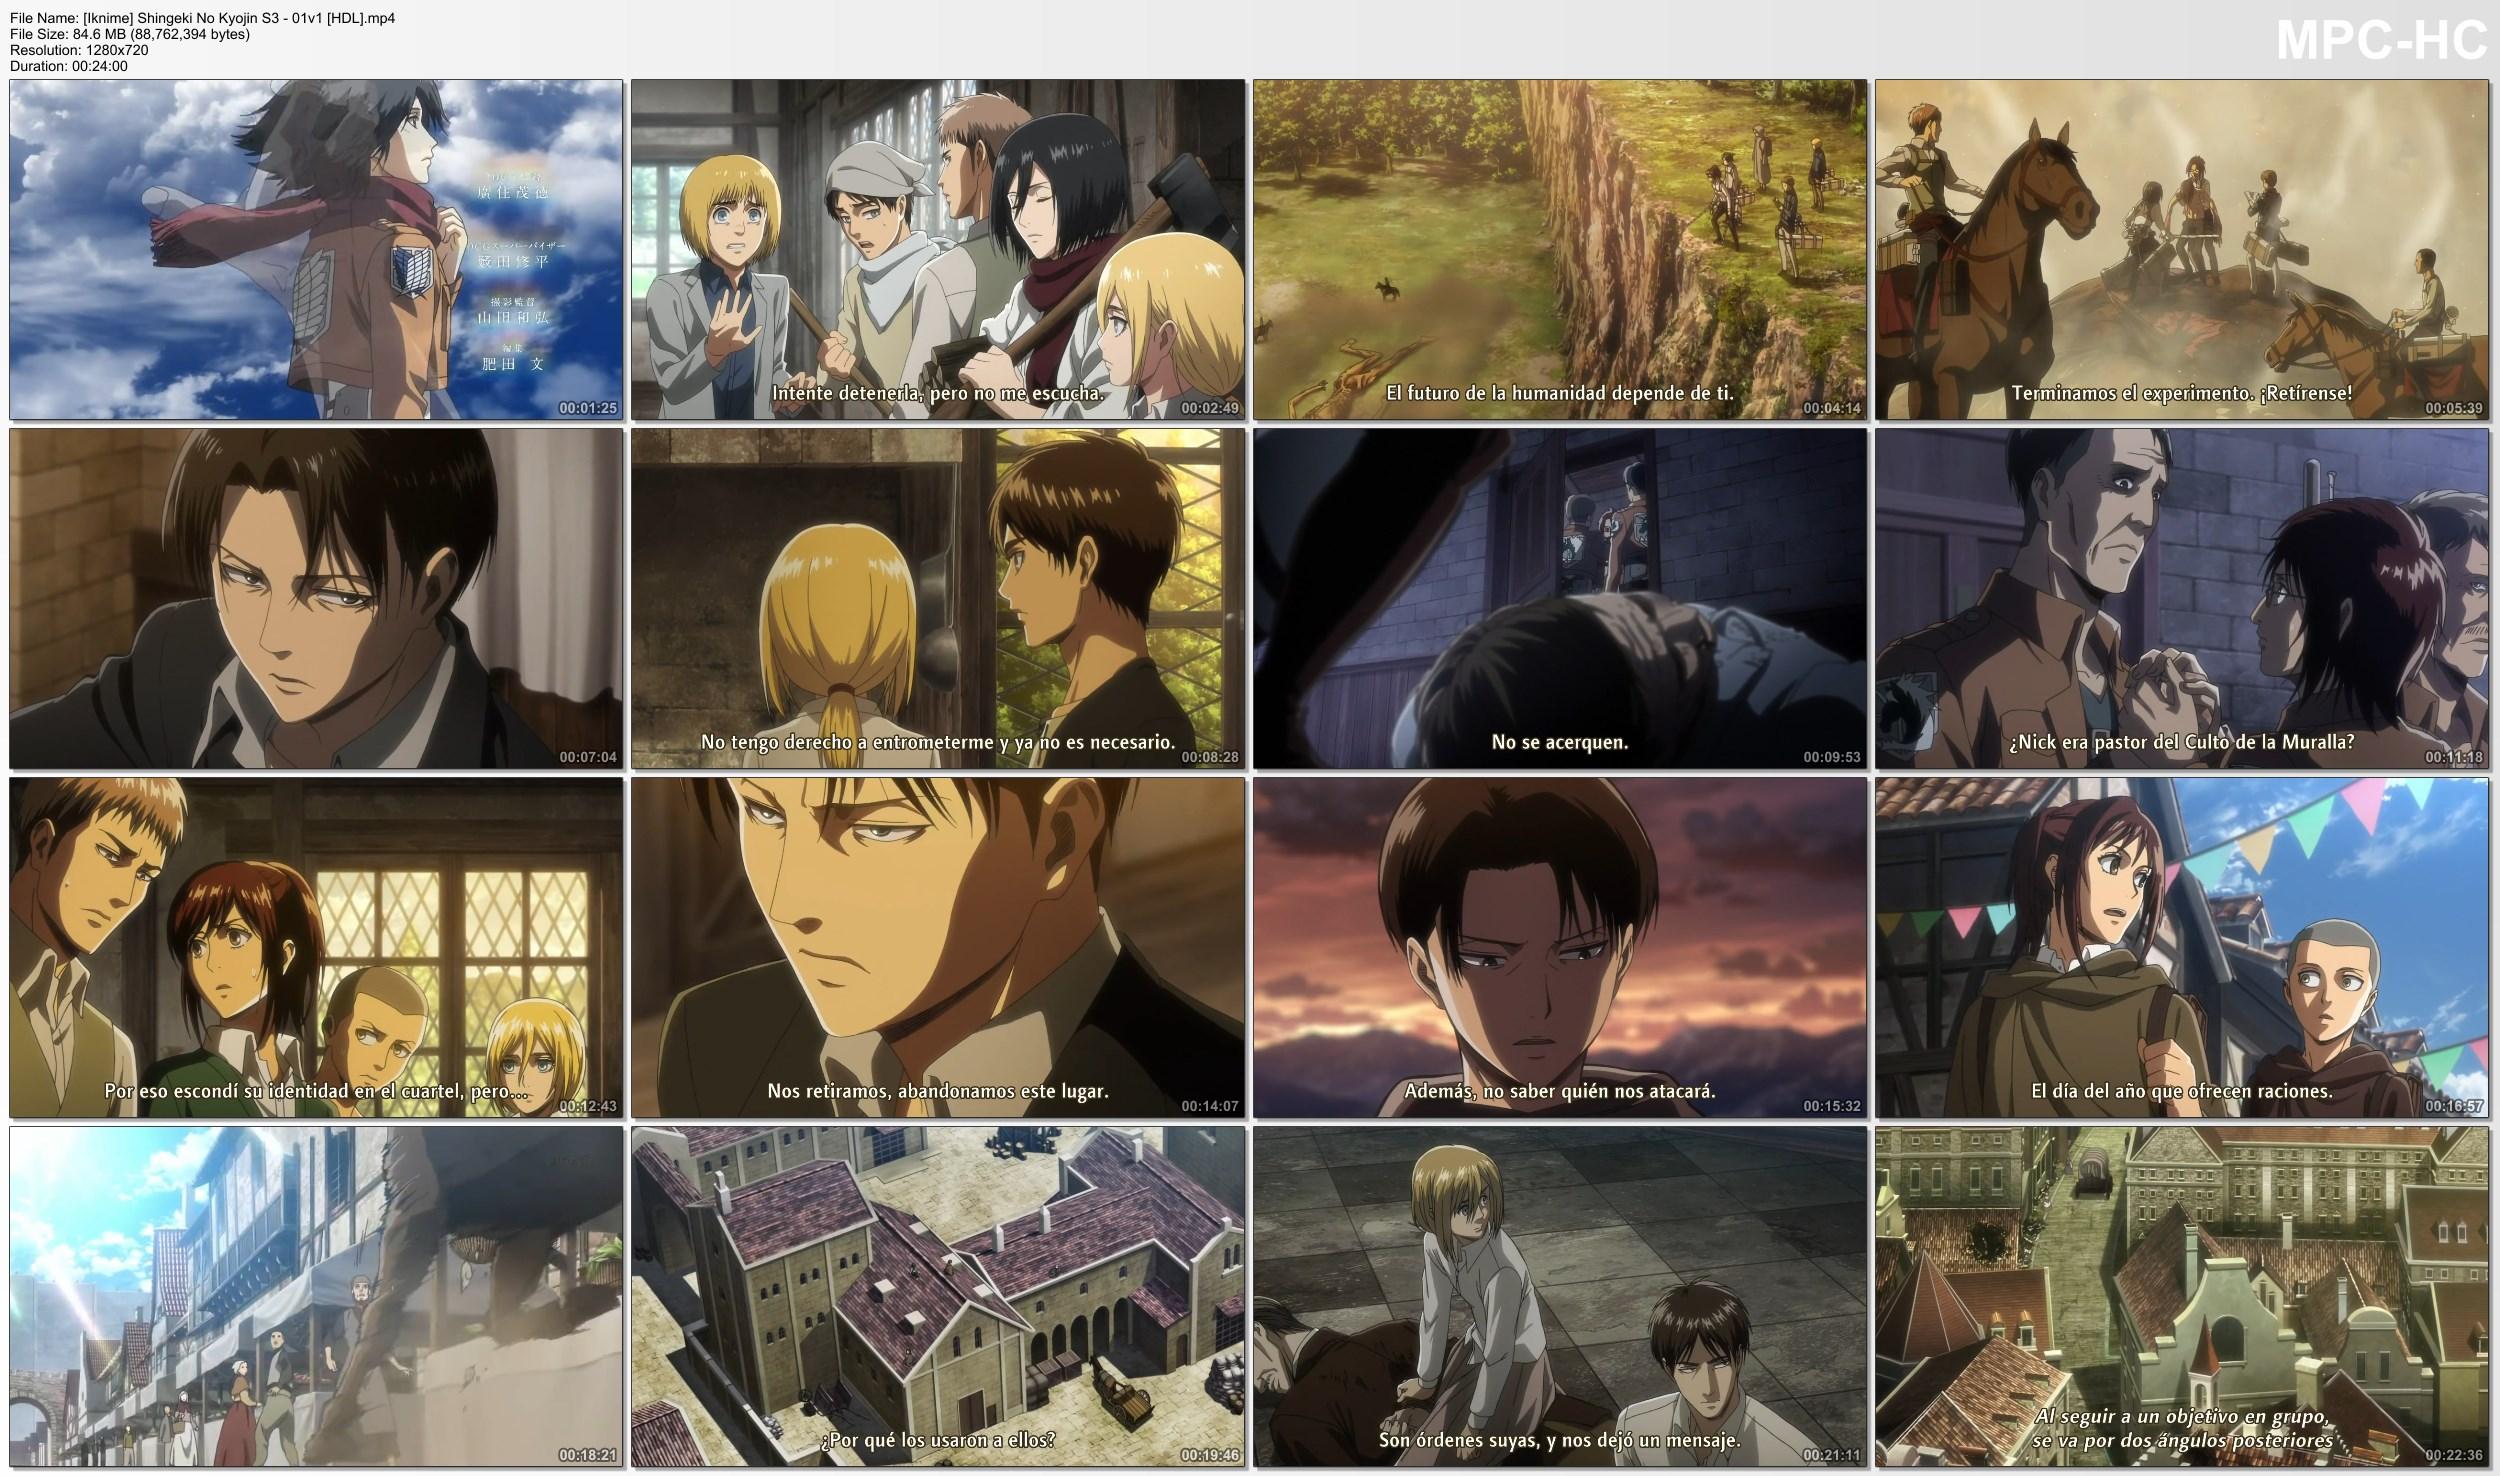 vp43qW7Zk67pw - [Aporte] Shingeki no Kyojin S3 [12/12][85MB][Iknime][H.265][TV][Finalizado] - Anime Ligero [Descargas]